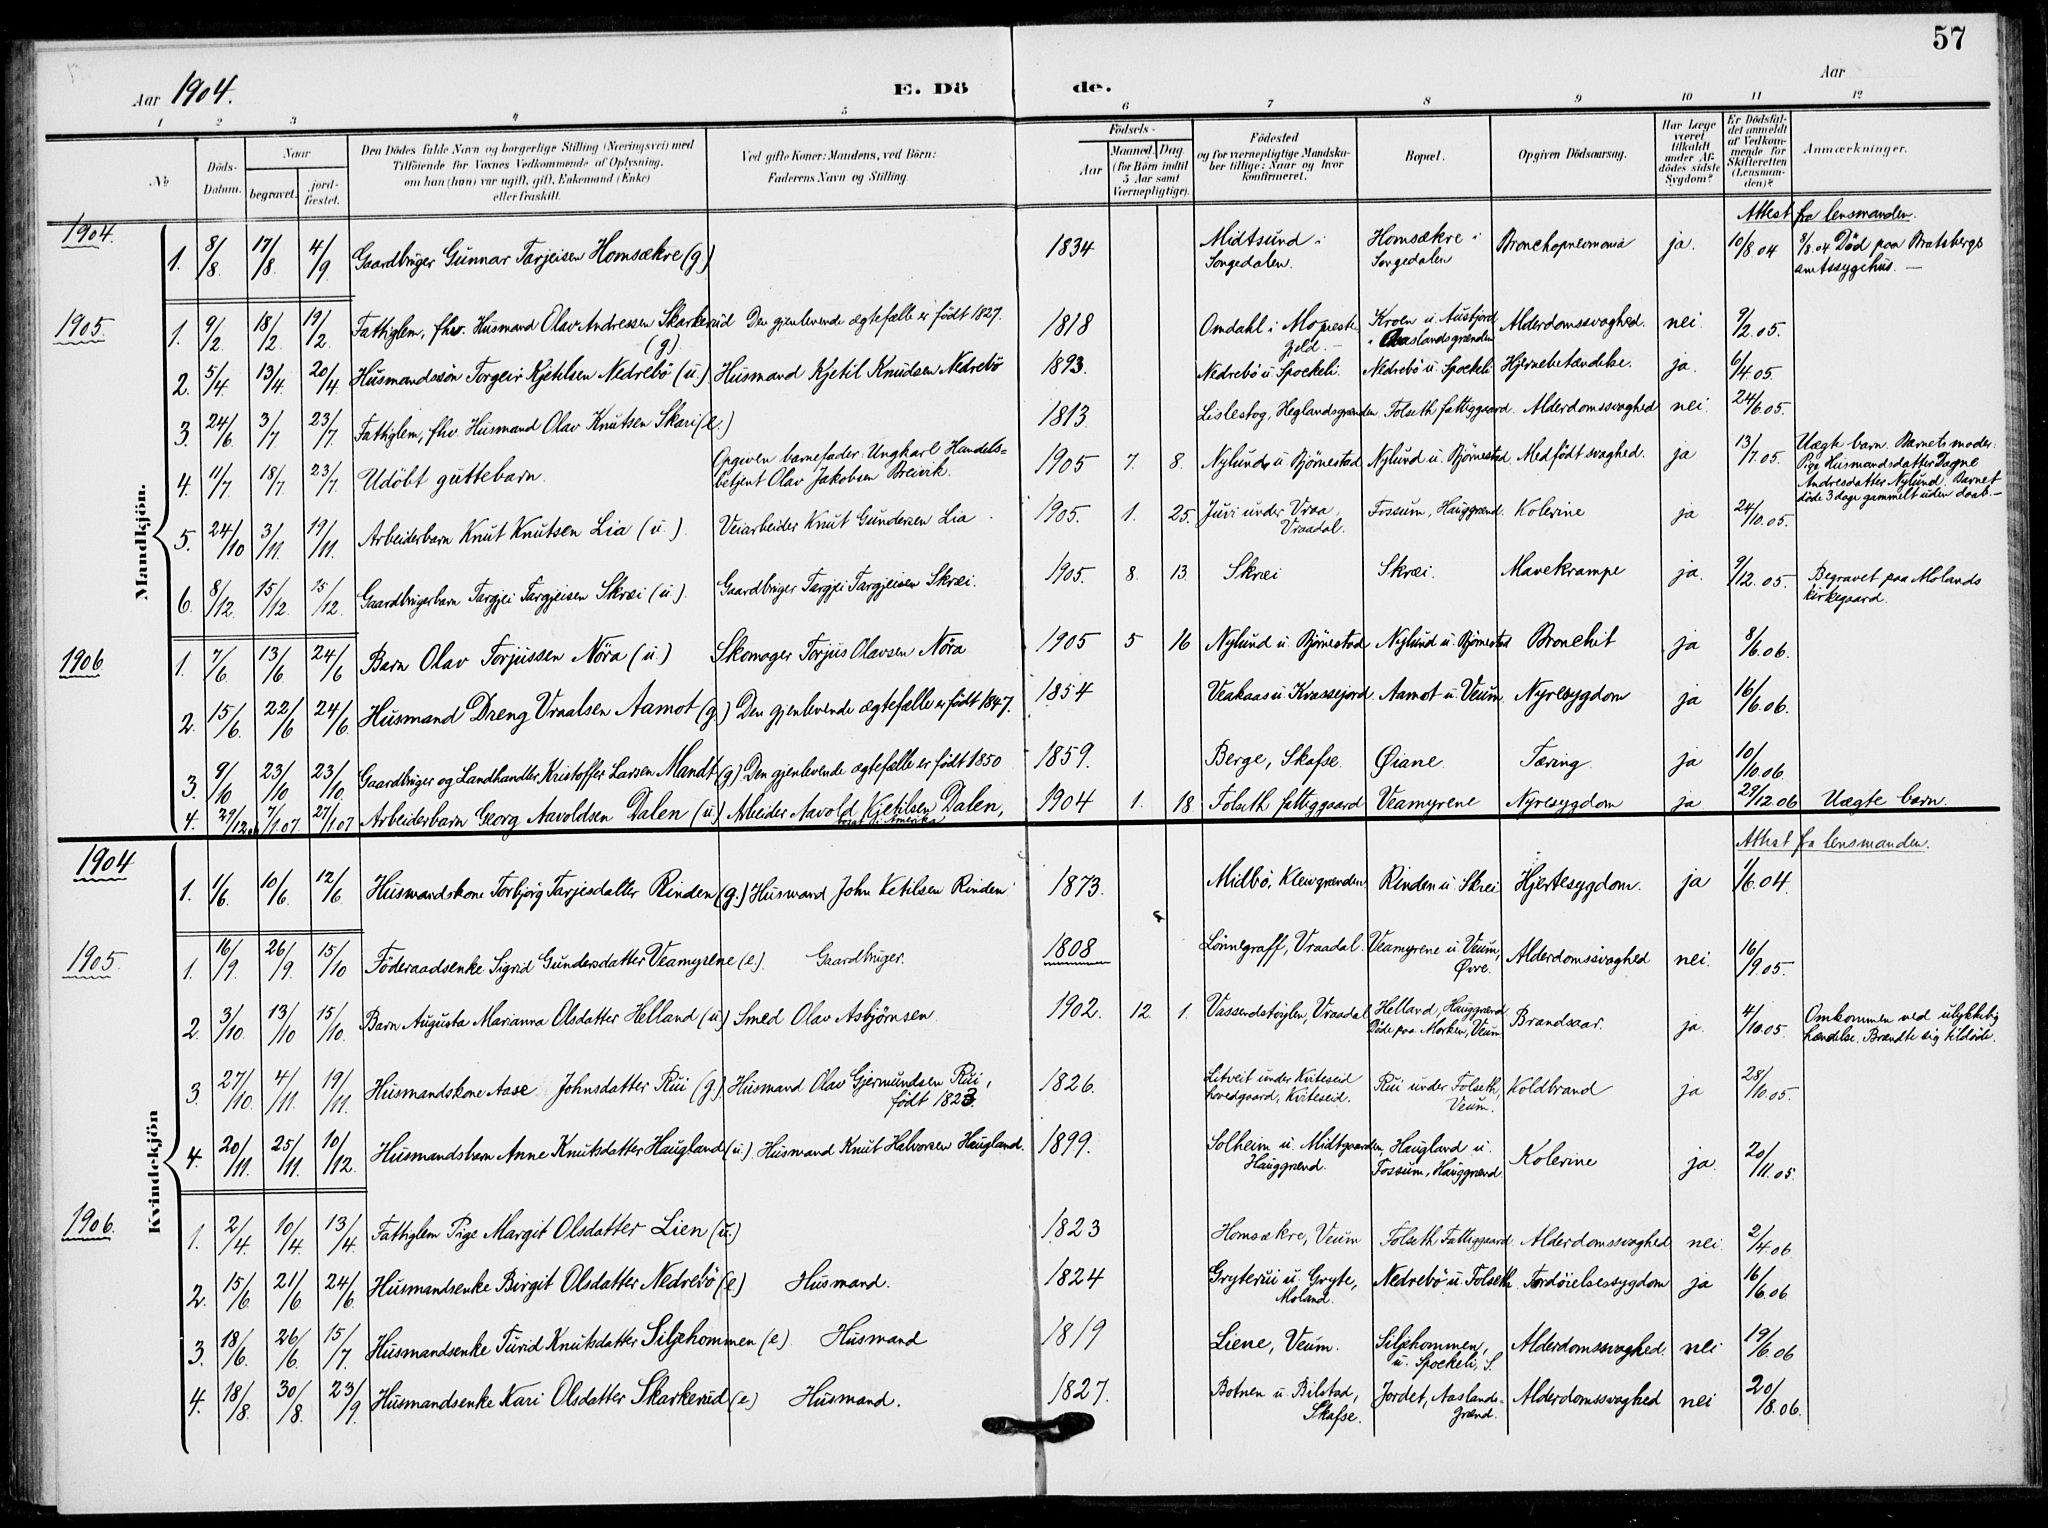 SAKO, Fyresdal kirkebøker, F/Fb/L0004: Ministerialbok nr. II 4, 1903-1920, s. 57